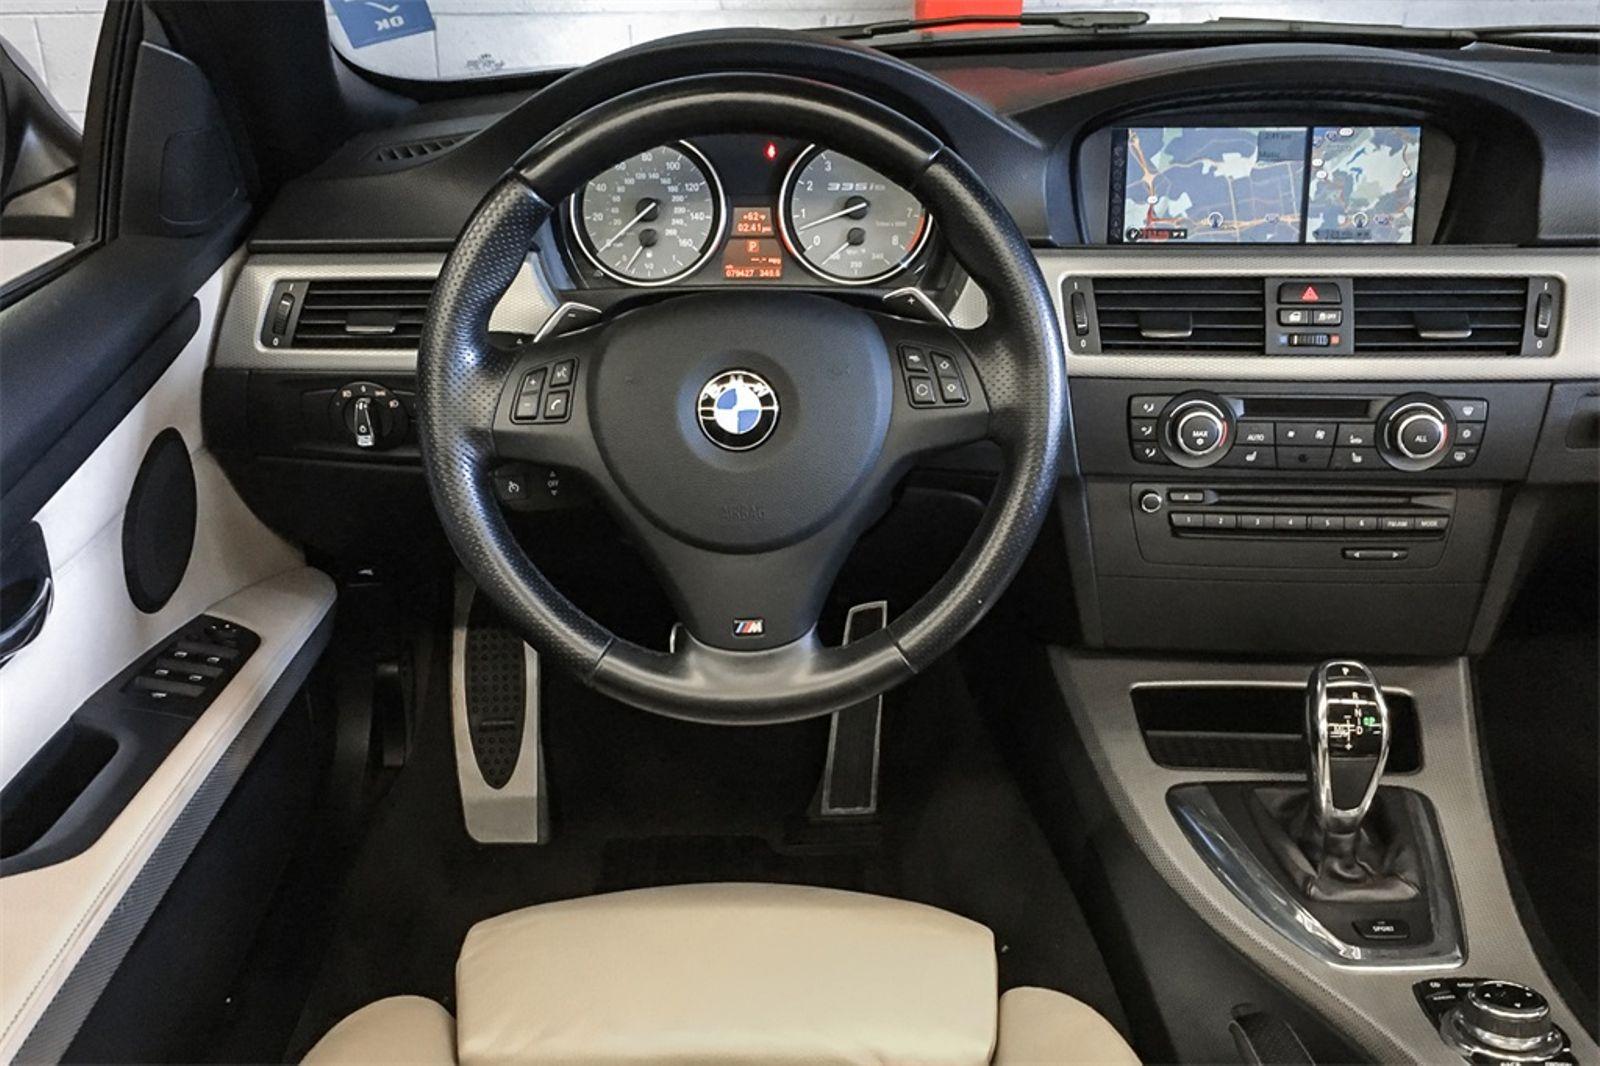 BMW Is City CA M Sport Motors - 2012 bmw 335is